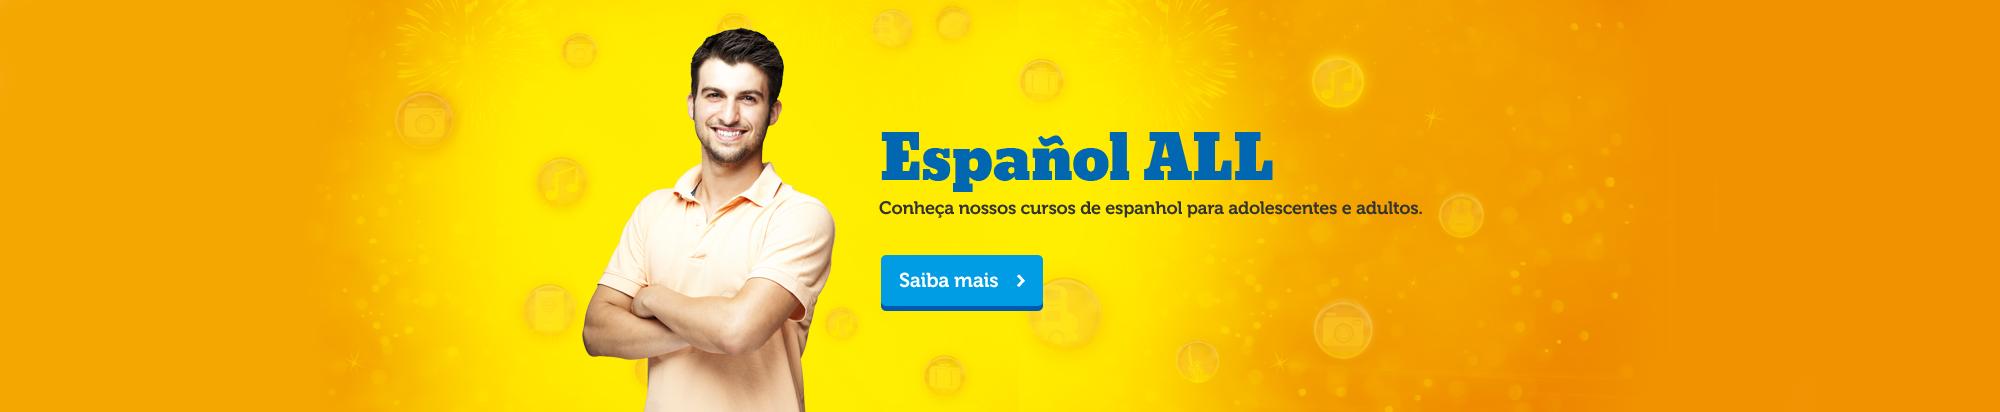 banner_home_espanhol_adulto